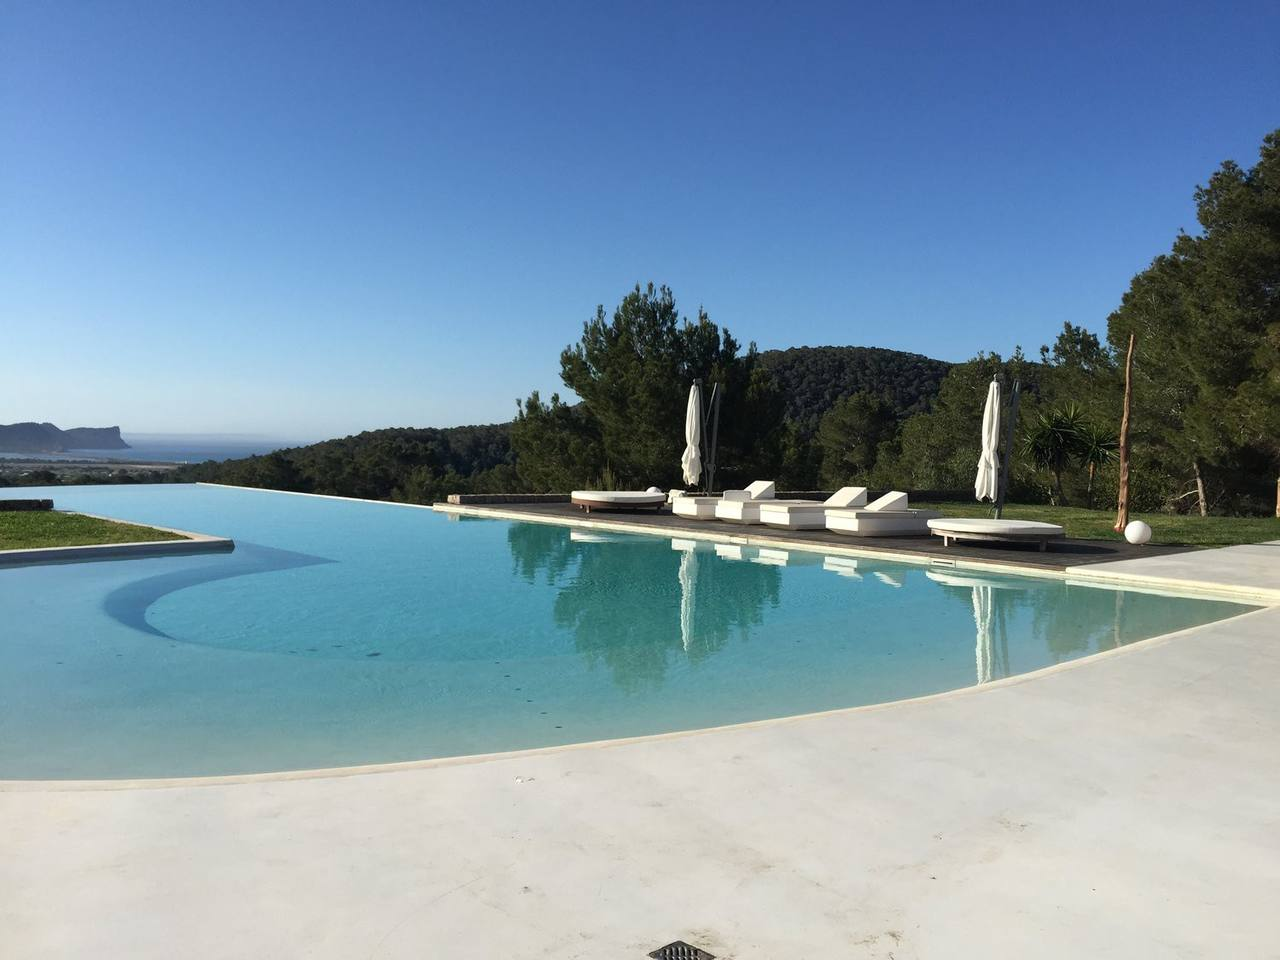 Sensational Villa with a huge infinity pool photo 23926475